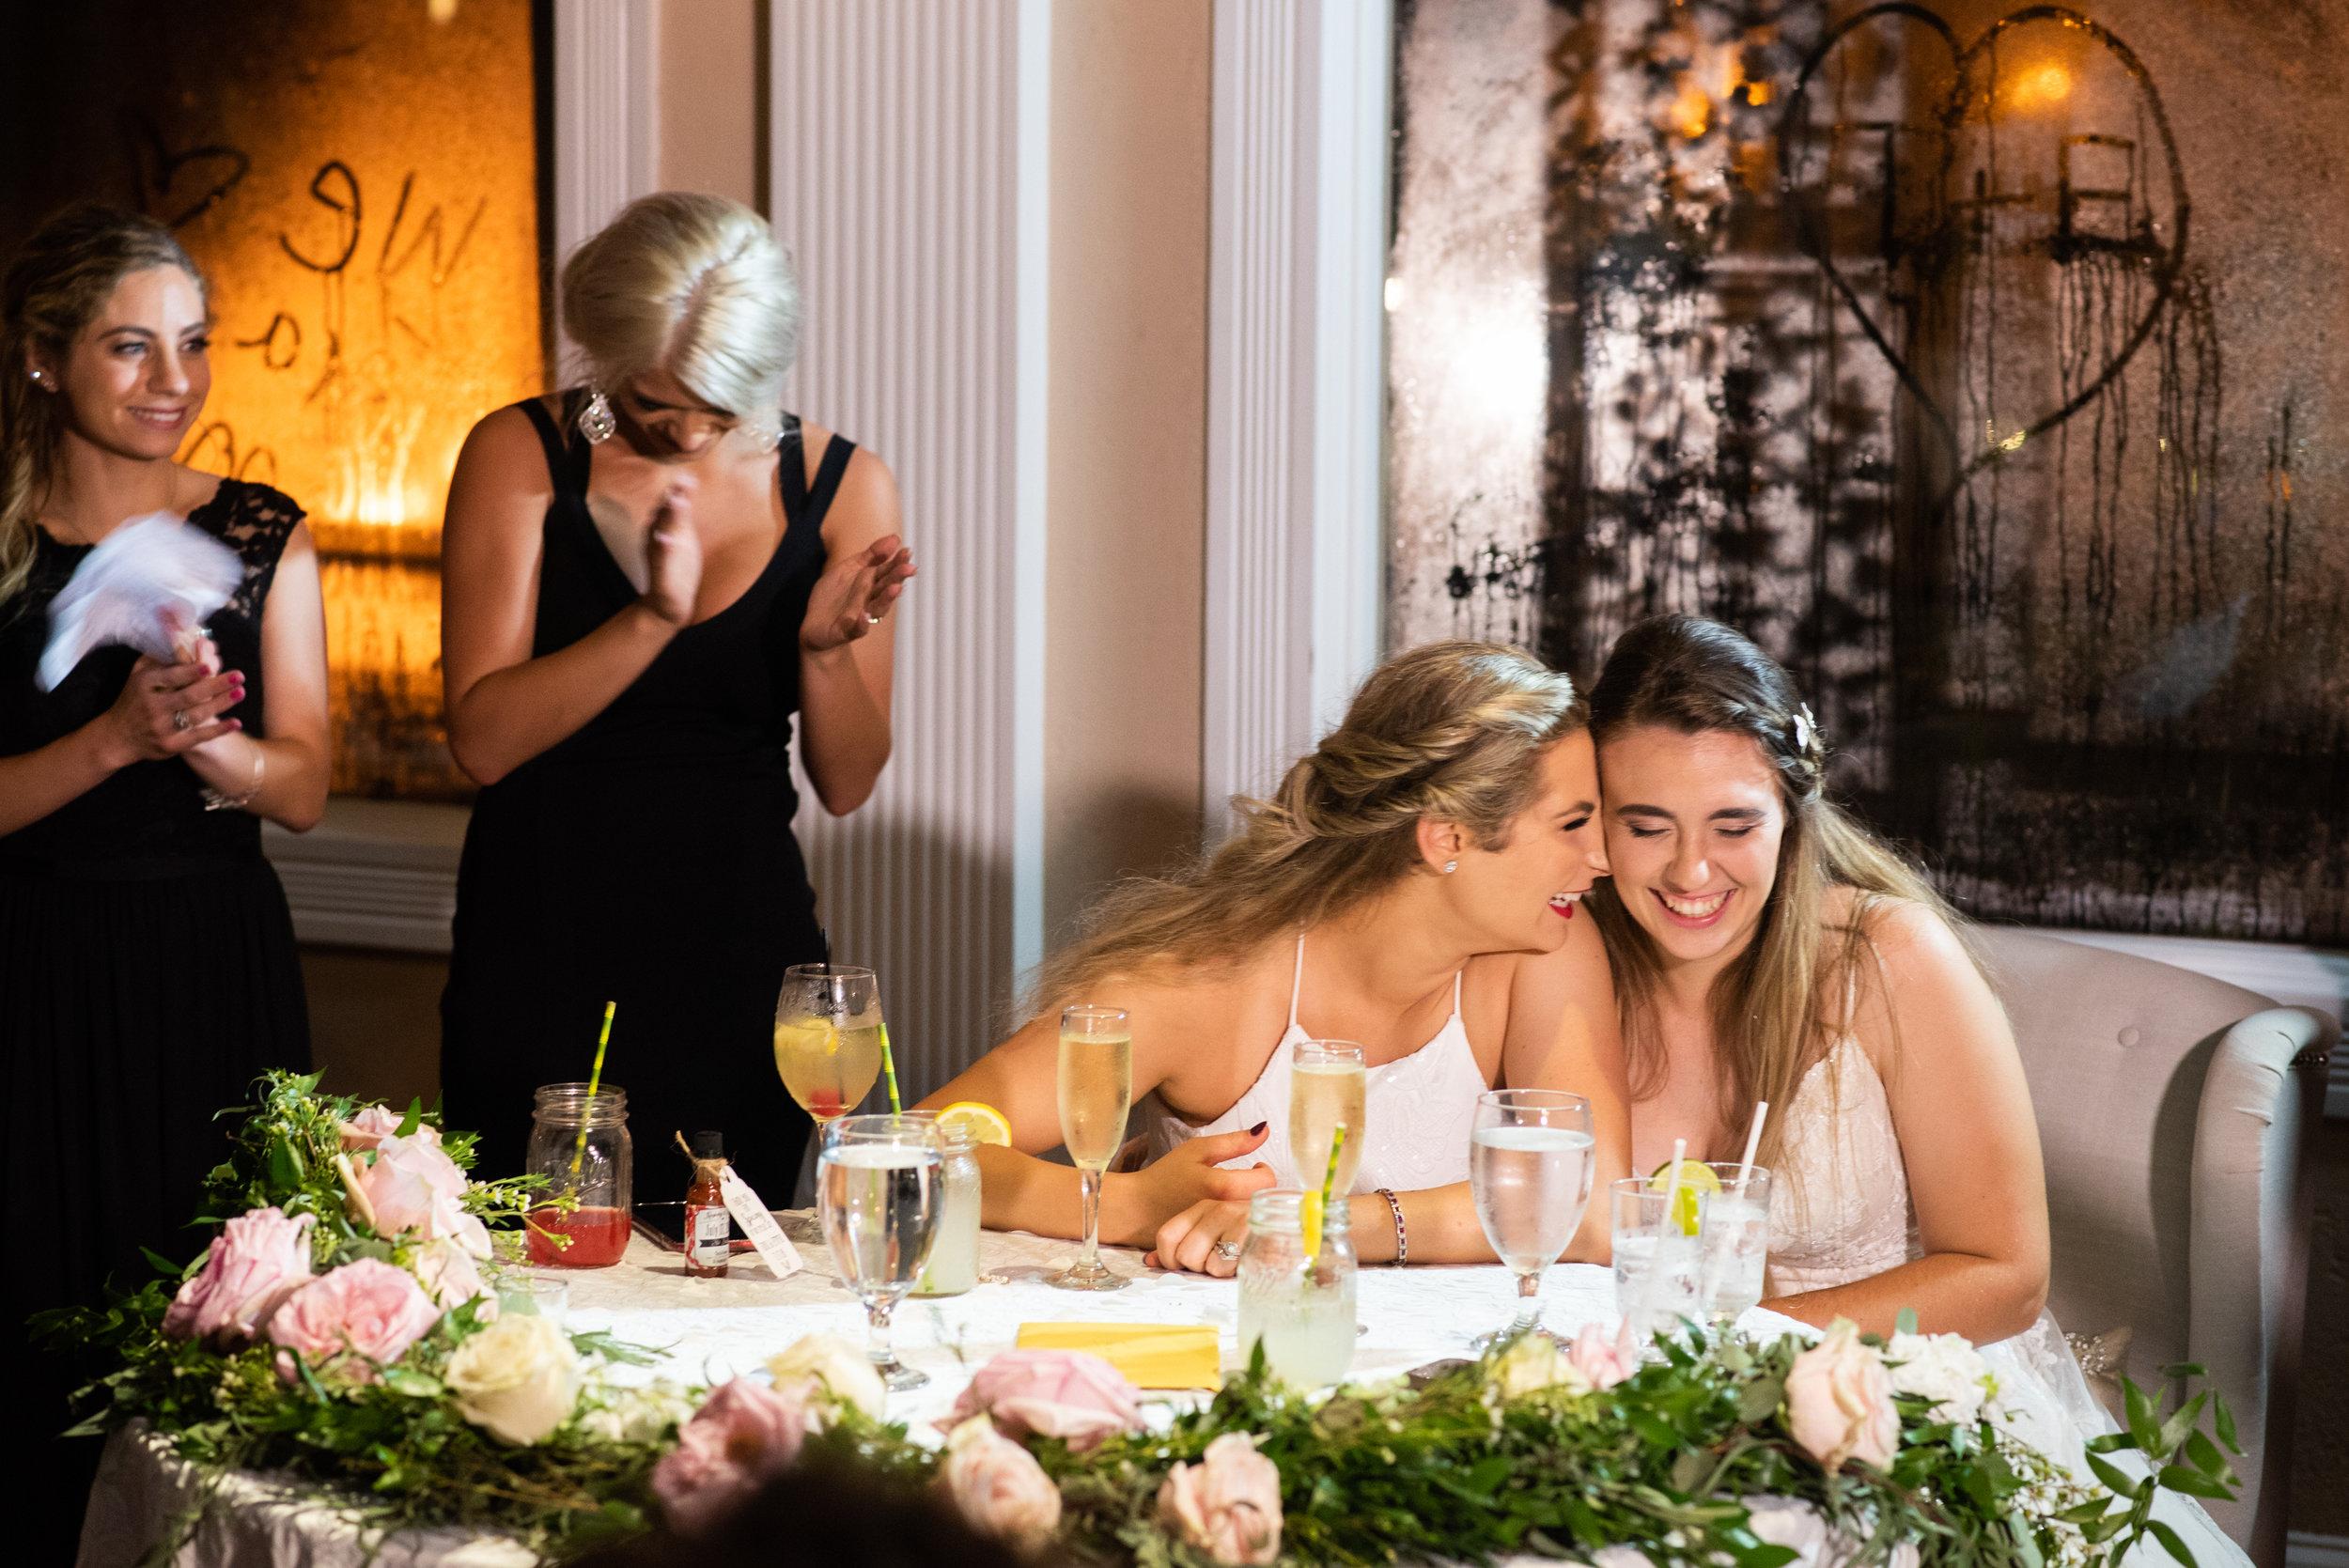 st-augustine-photographer-st-augustine-gay-wedding-sam-sex-wedding-photographer-sarah-annay-photography-white-room-weddings-62.jpg